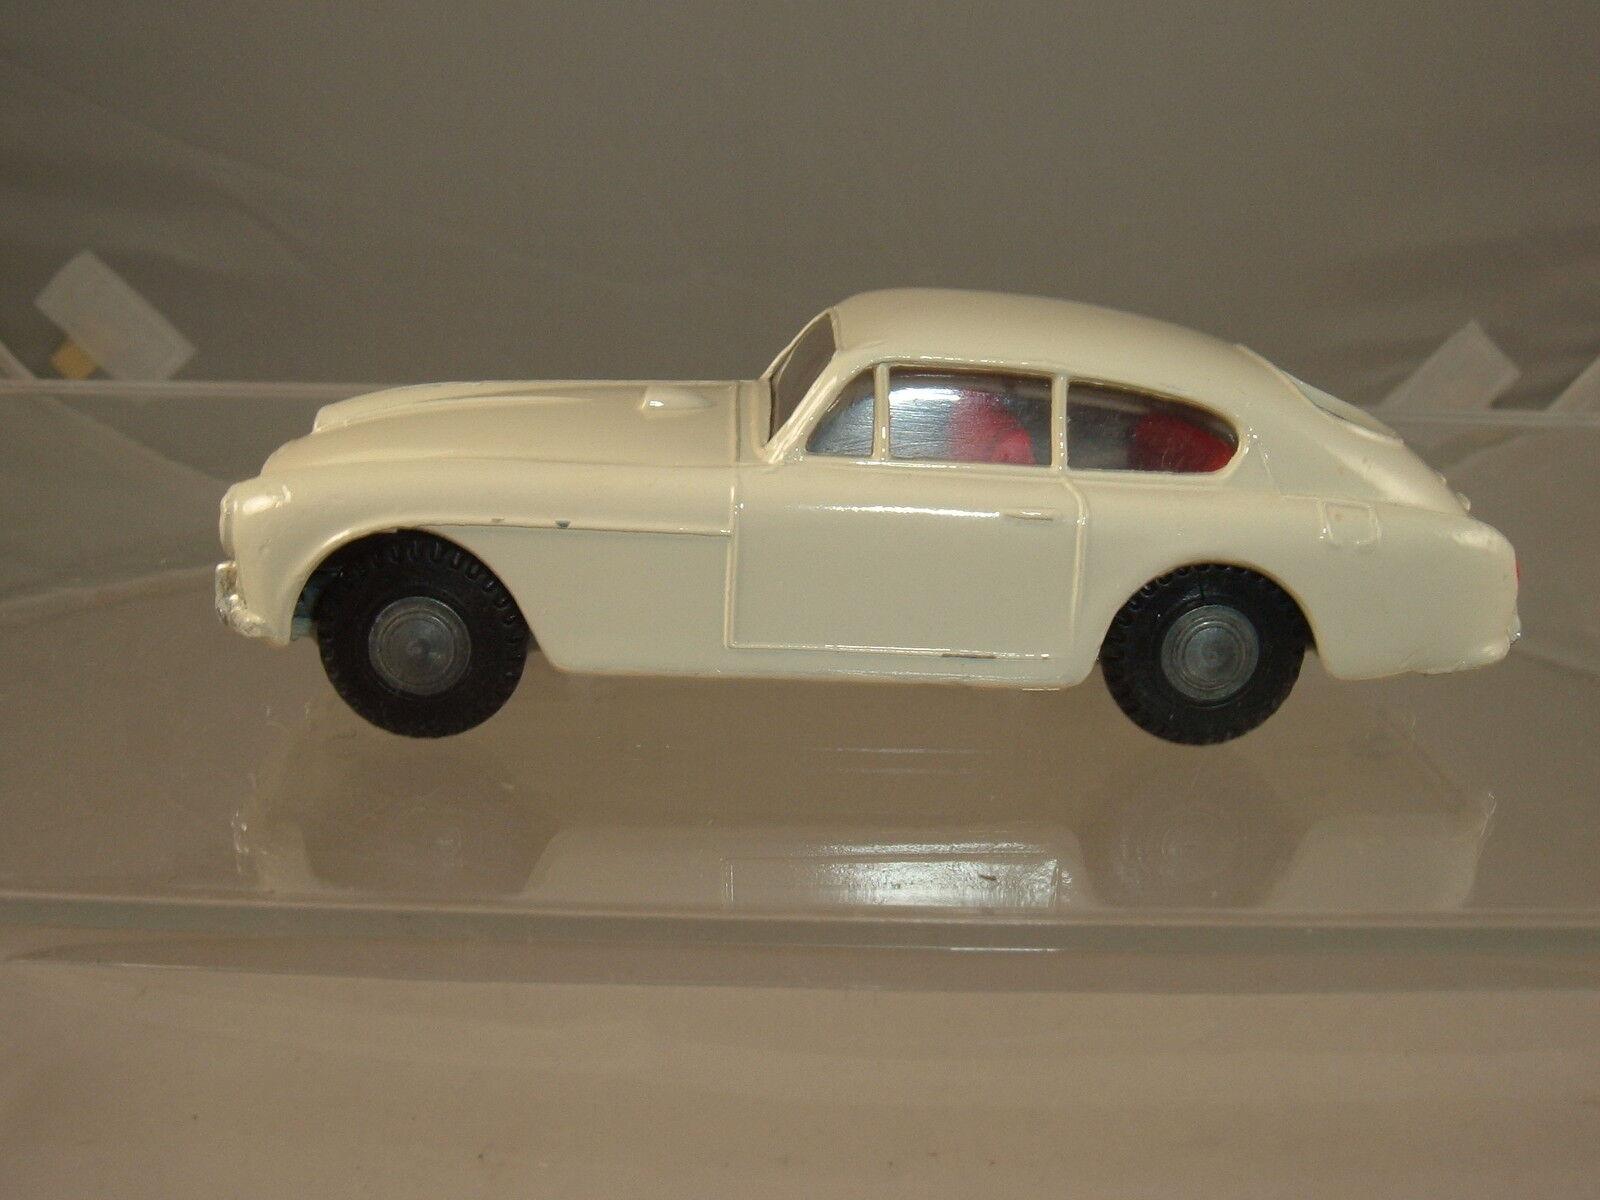 Spot De De De Aston Martin Repintado condición Vintage Bonita  75c7c0